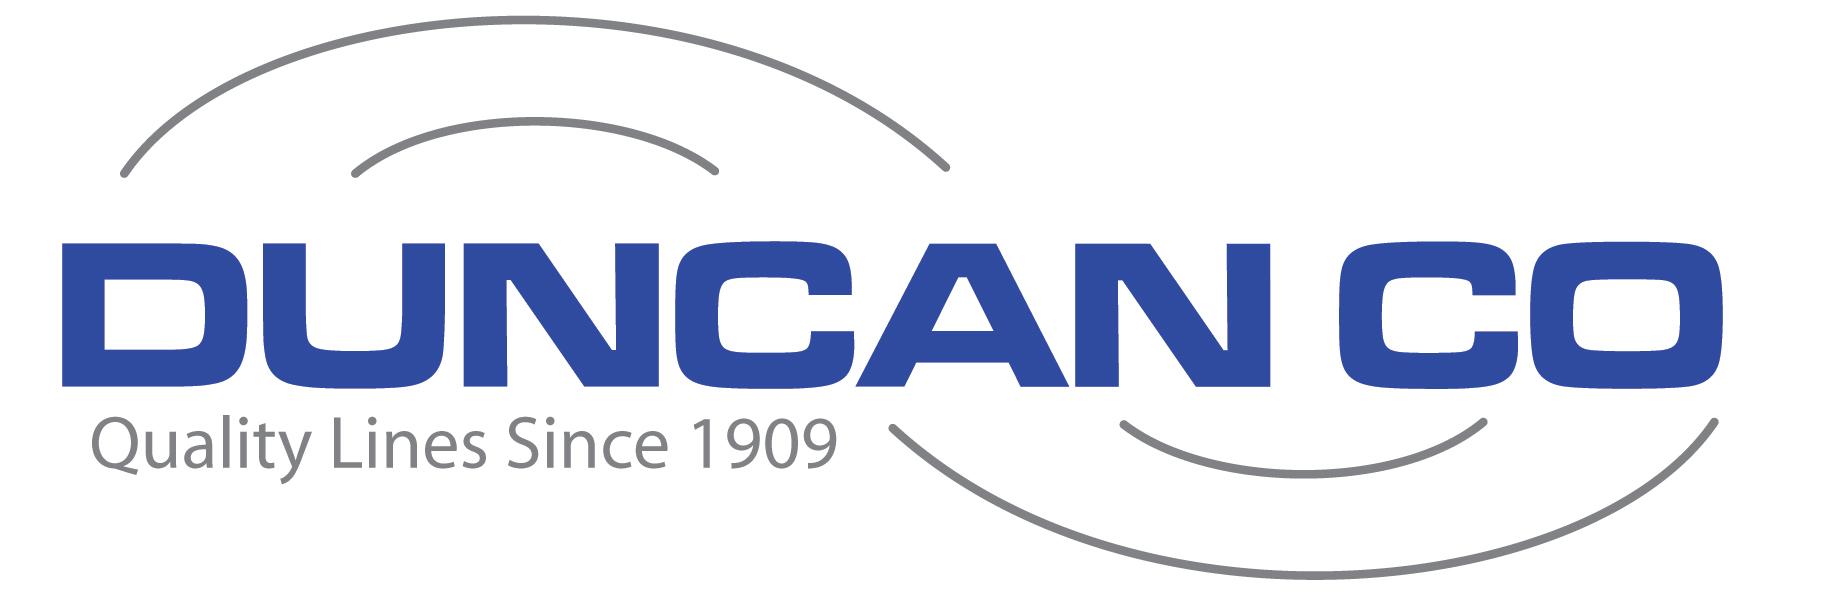 Duncan Company